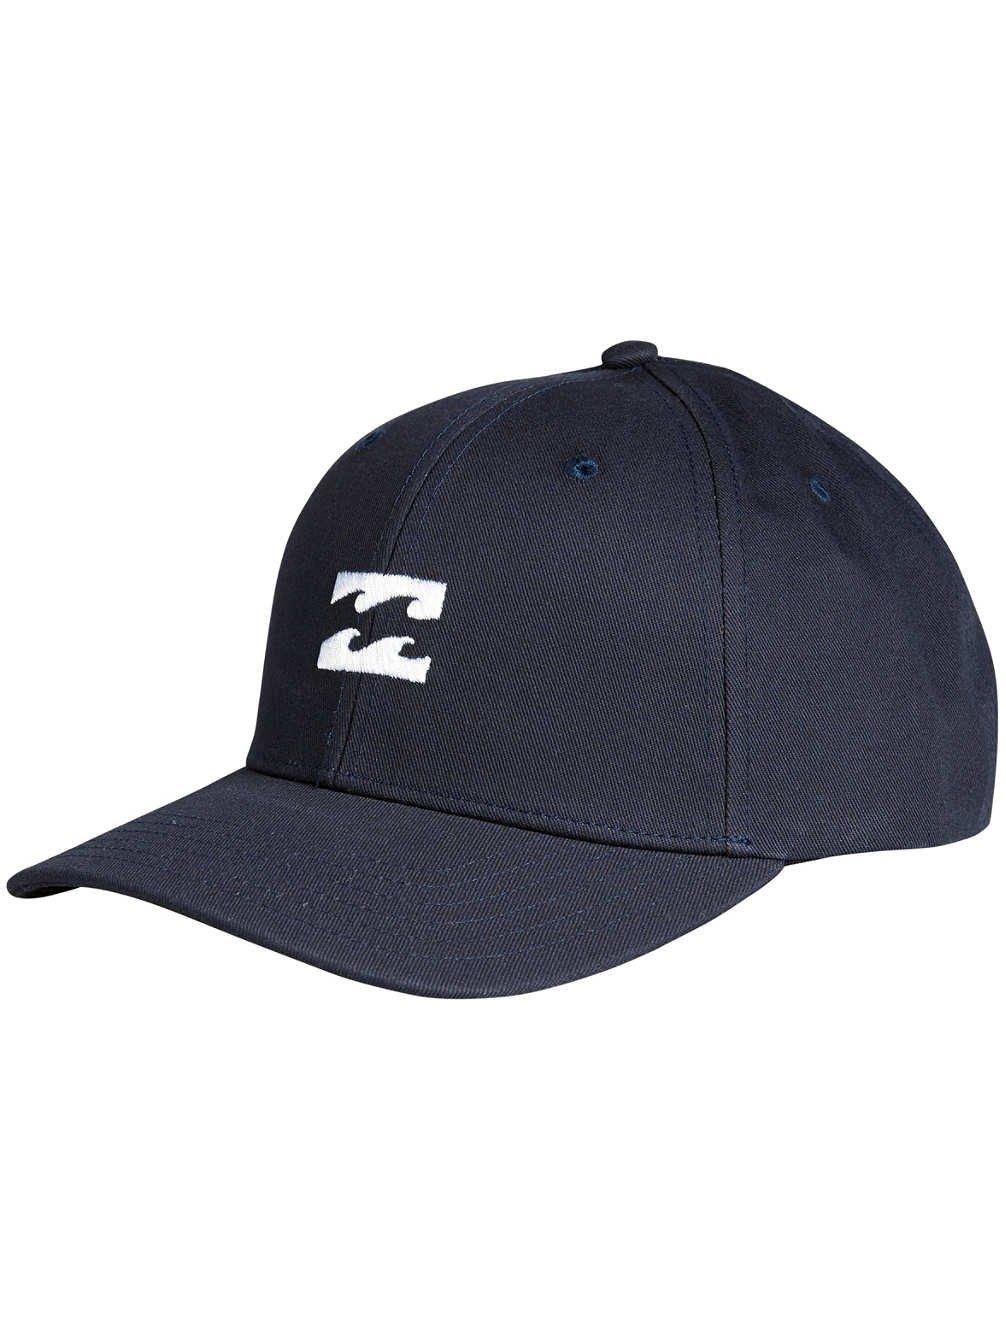 Billabong Emblem Snapback Cap, Herren Einheitsgröße H5CM01